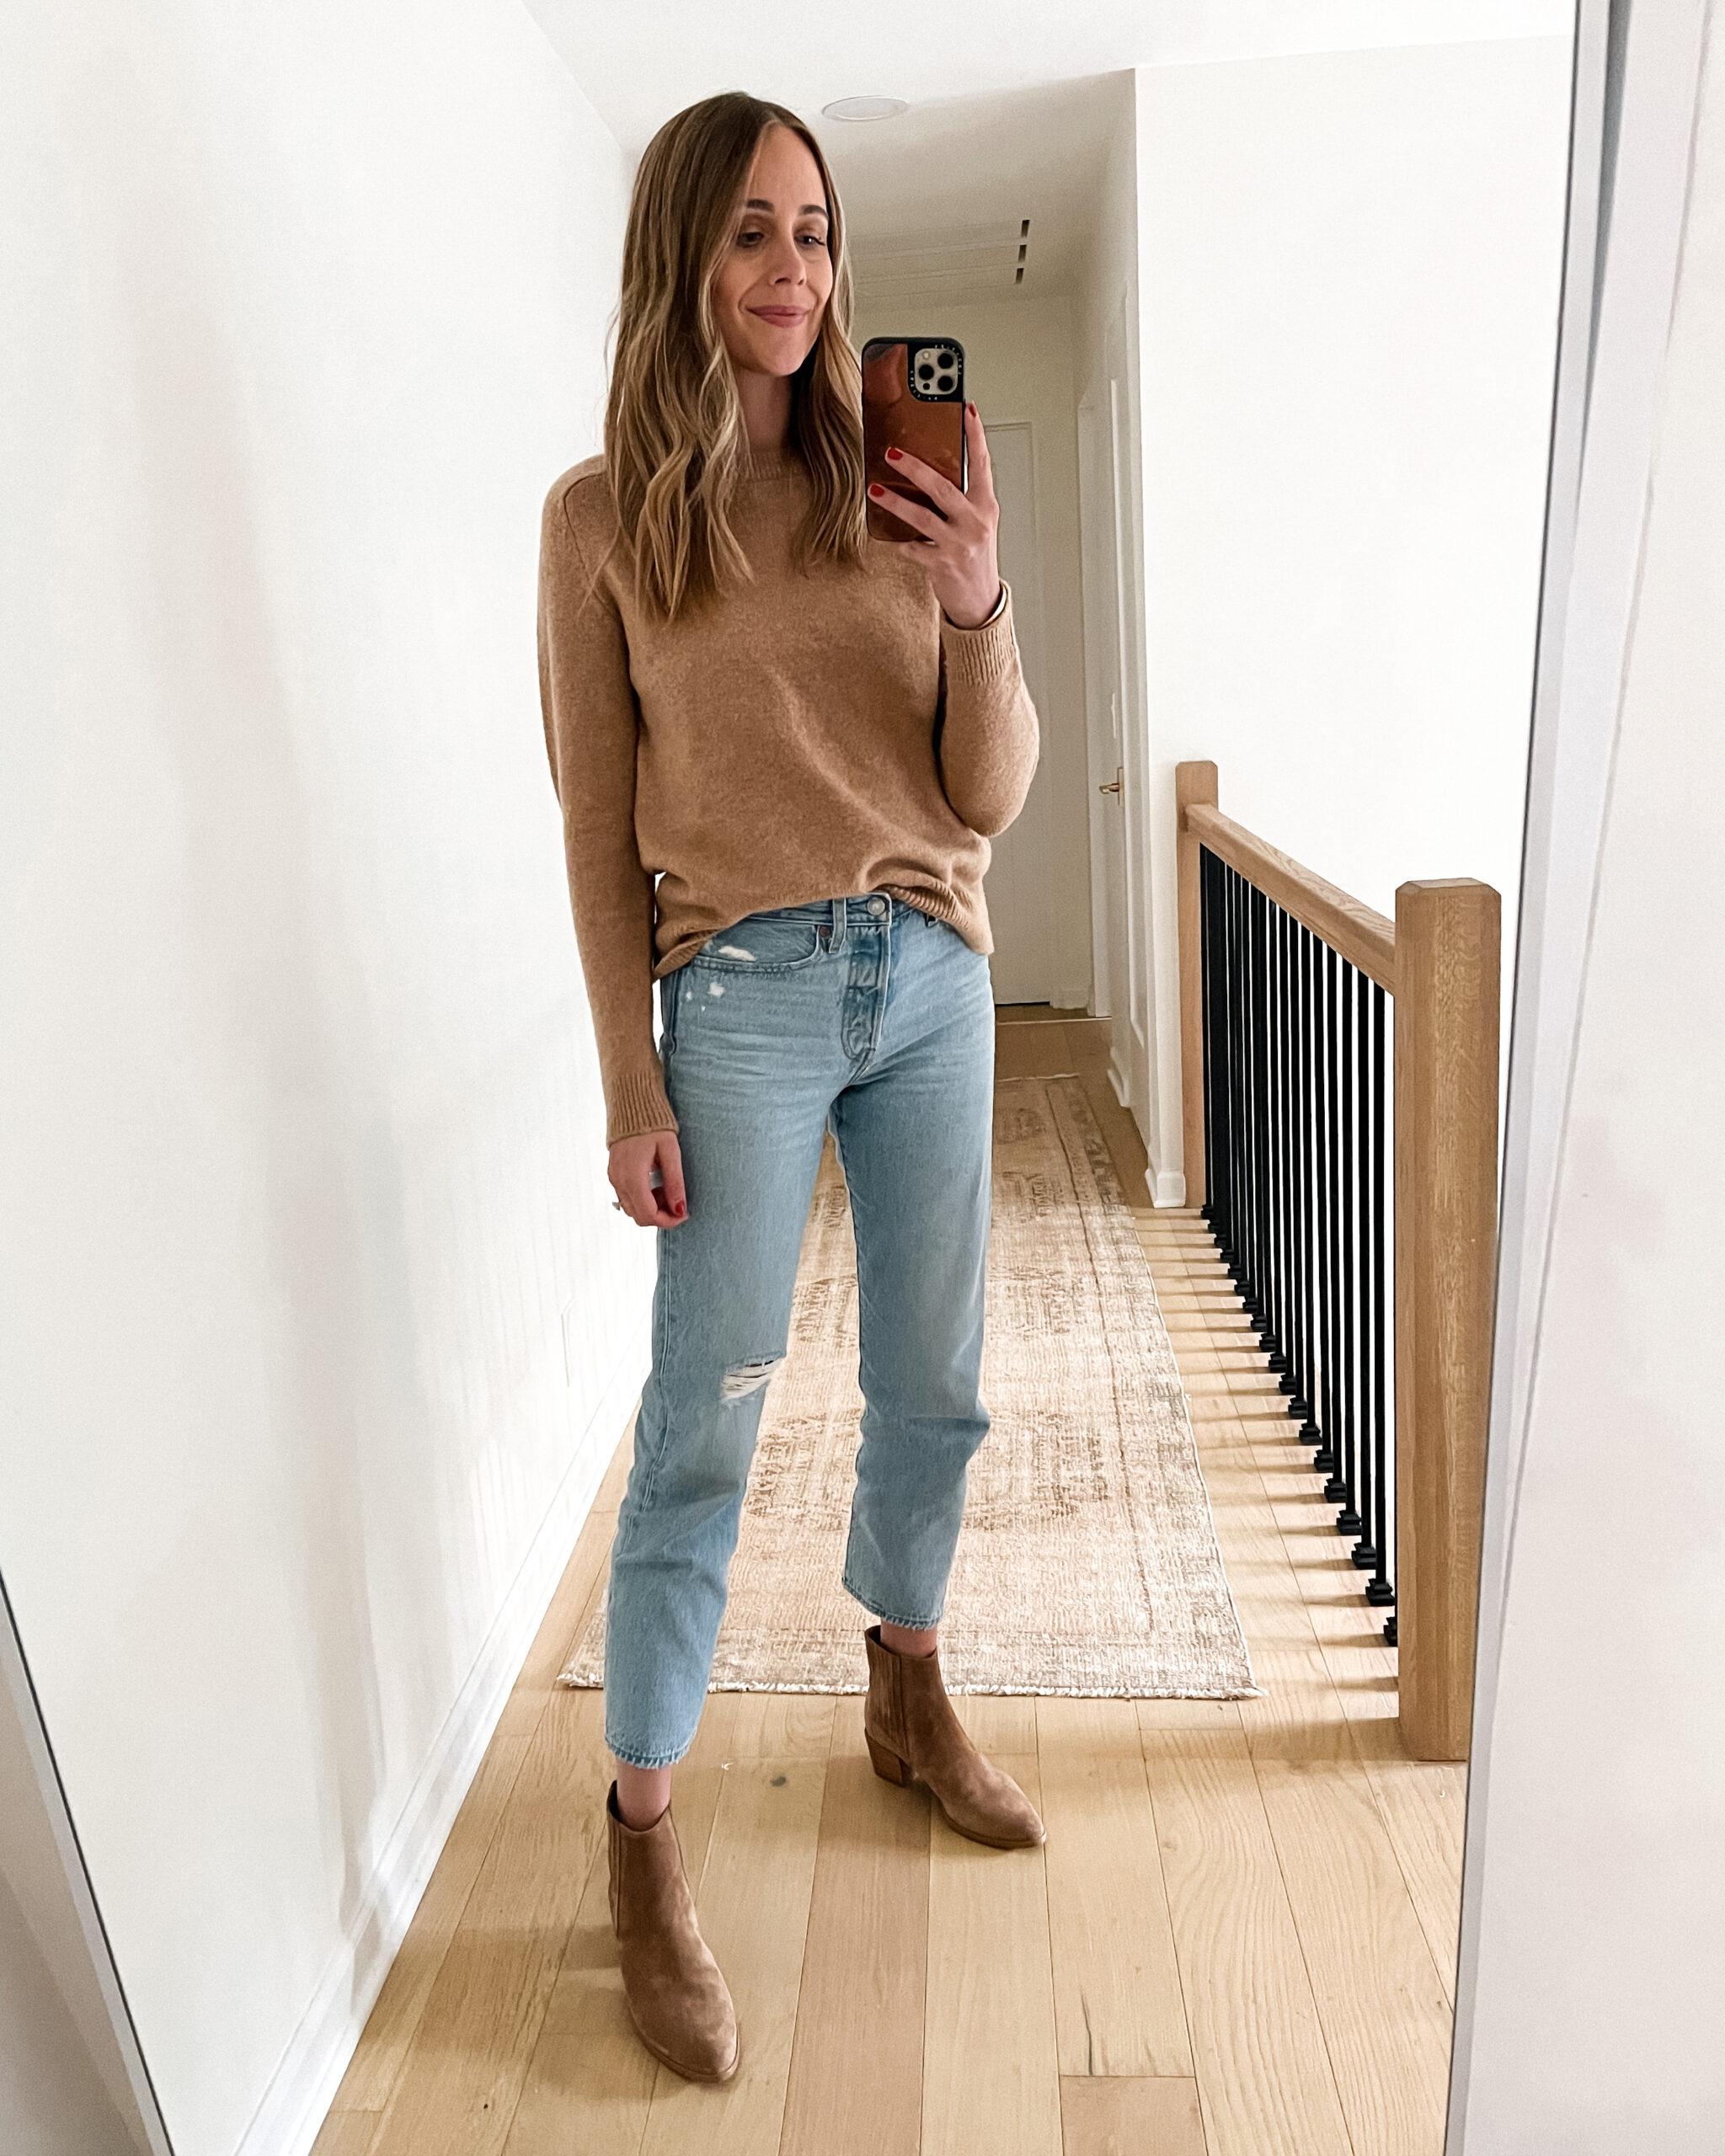 Fashion Jackson Wearing Amazon Fashion Camel Sweater Ripped Jeans Tan Booties